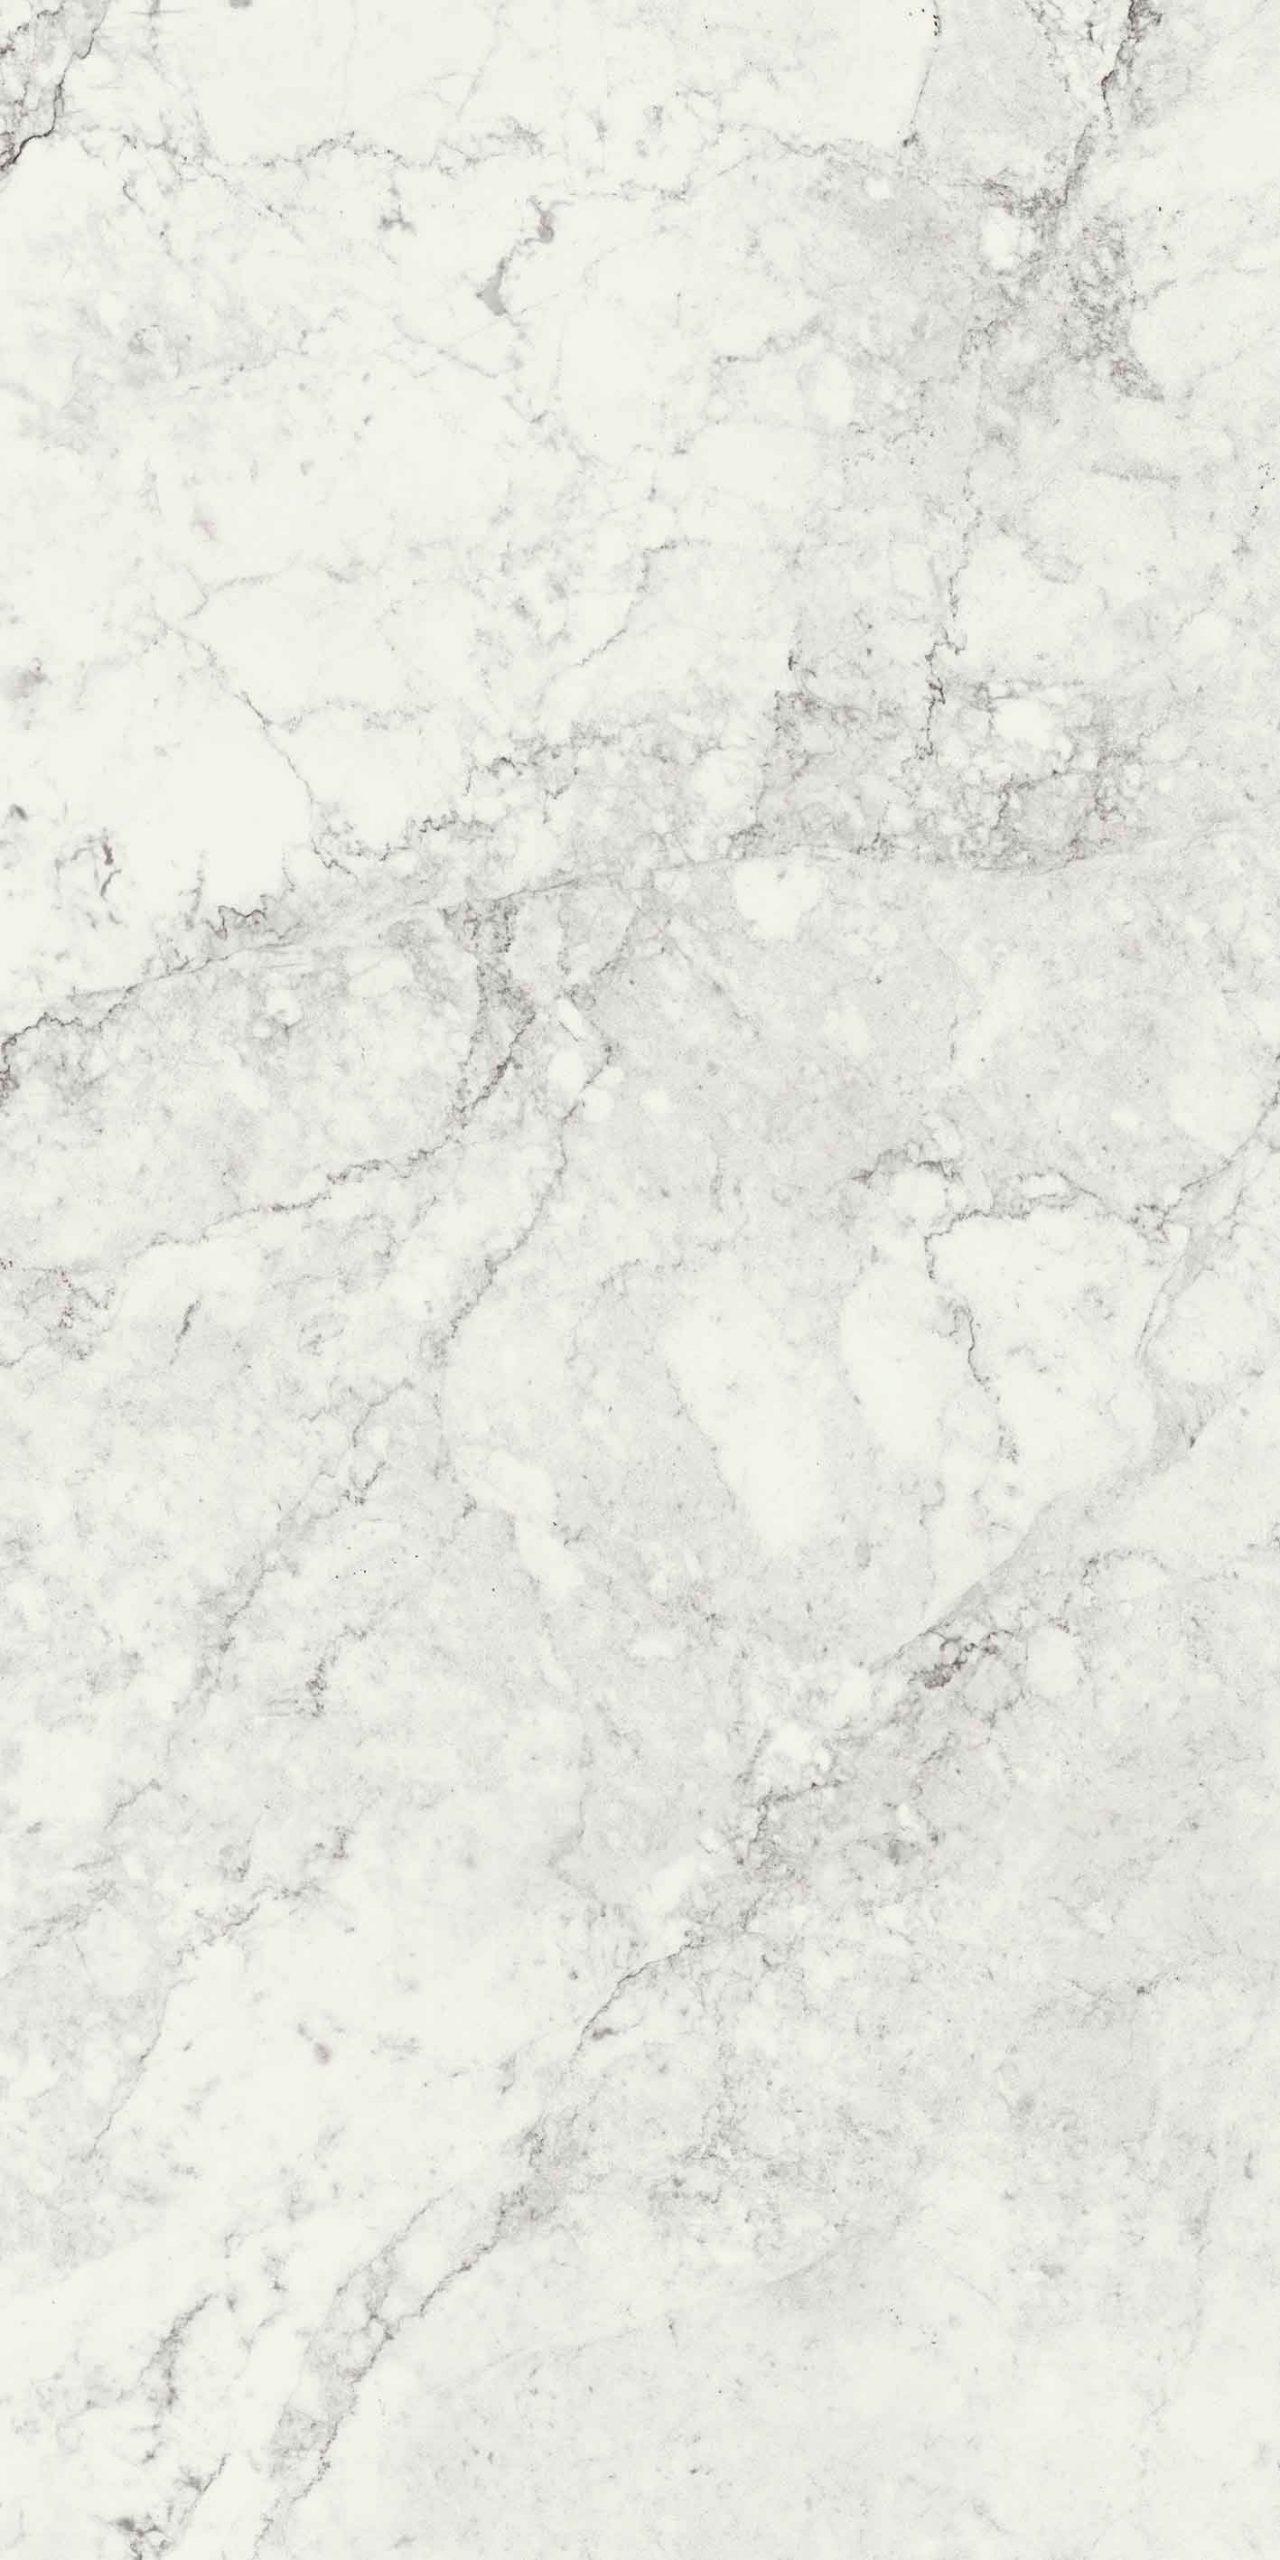 Exalt of Cerim Fairy White Glossy 10mm 60 x 120